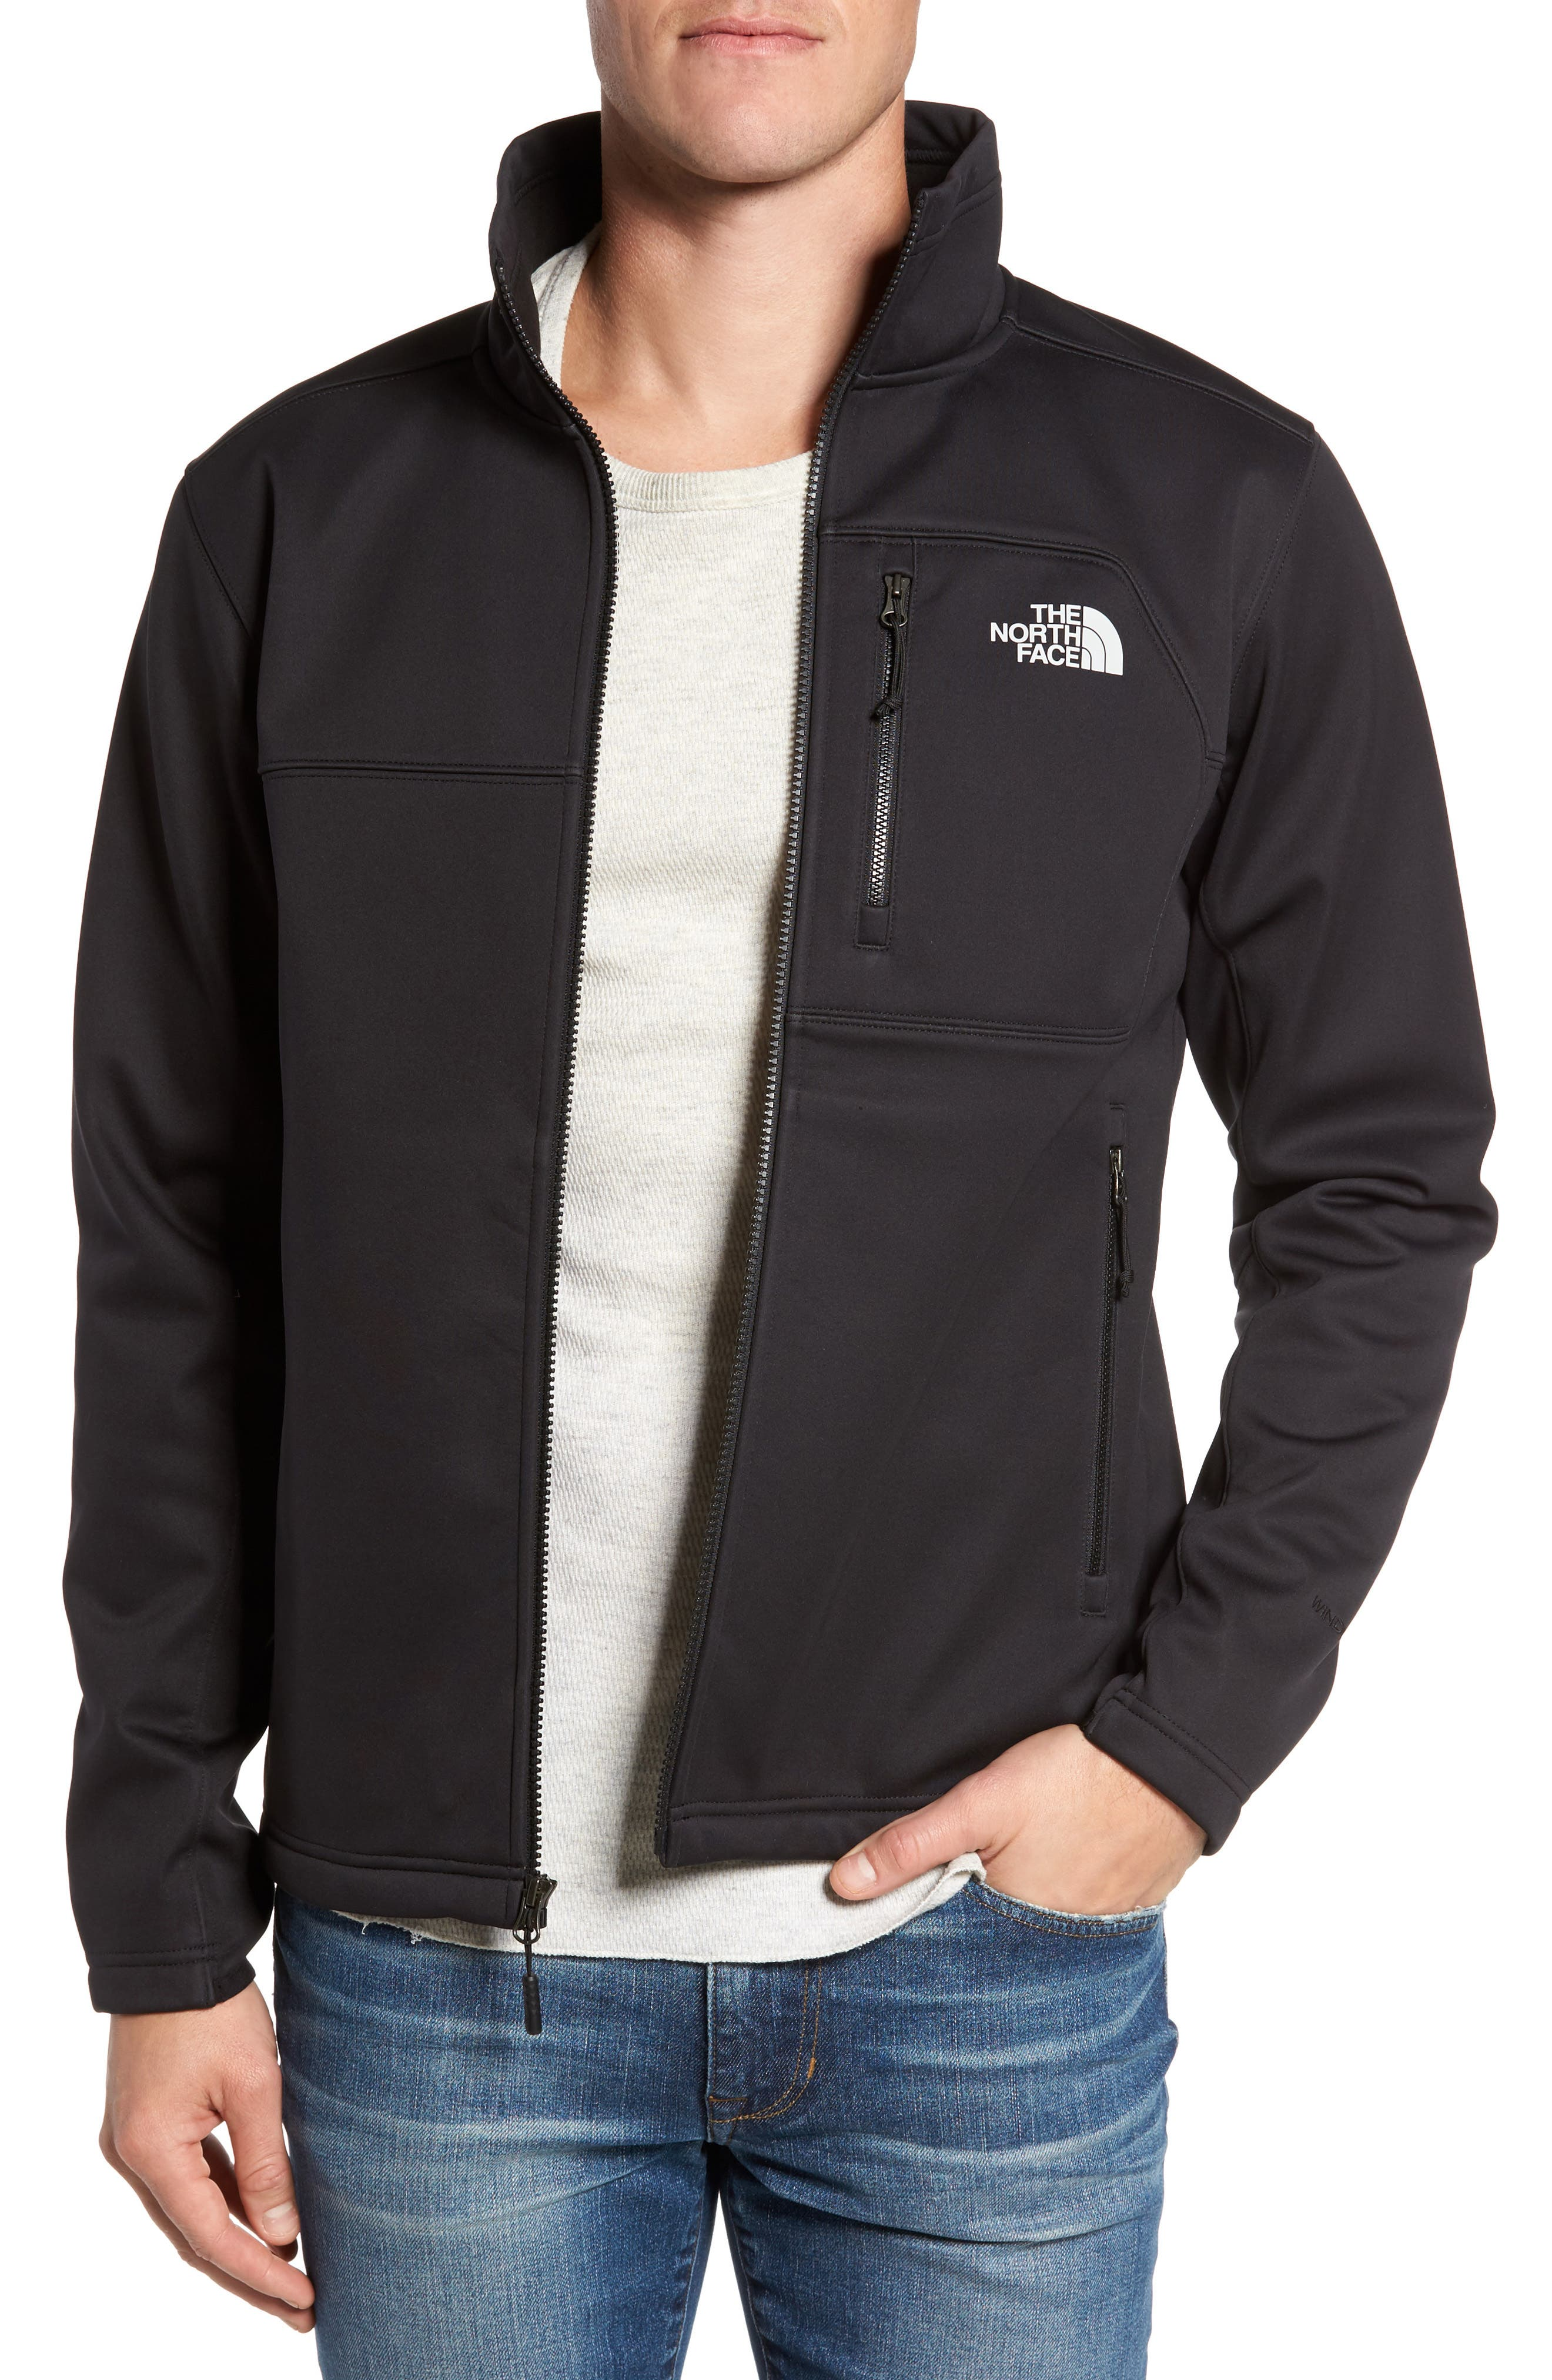 THE NORTH FACE Apex Risor Jacket, Main, color, BLACK/ BLACK